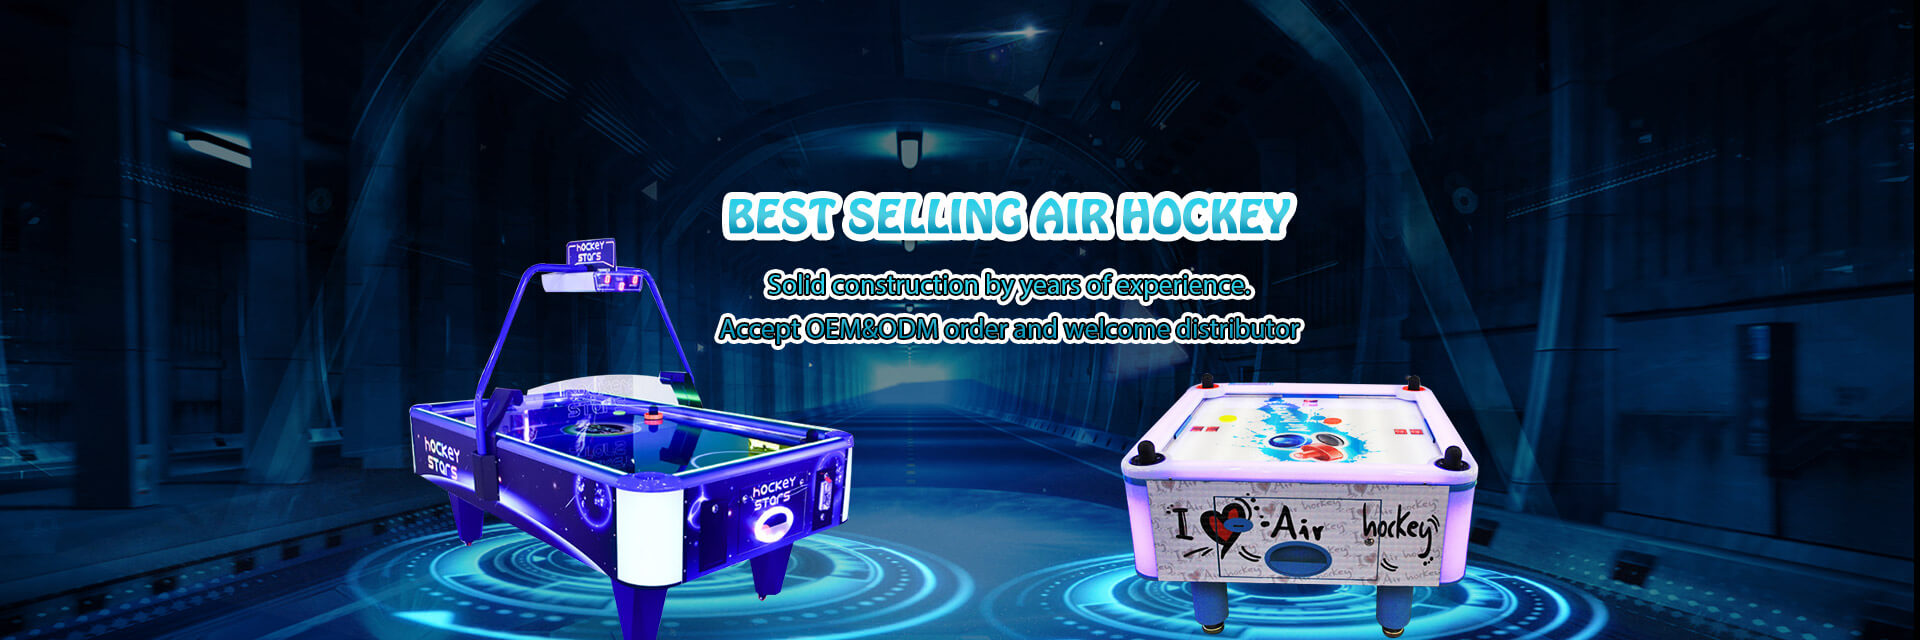 Sport Arcade Games